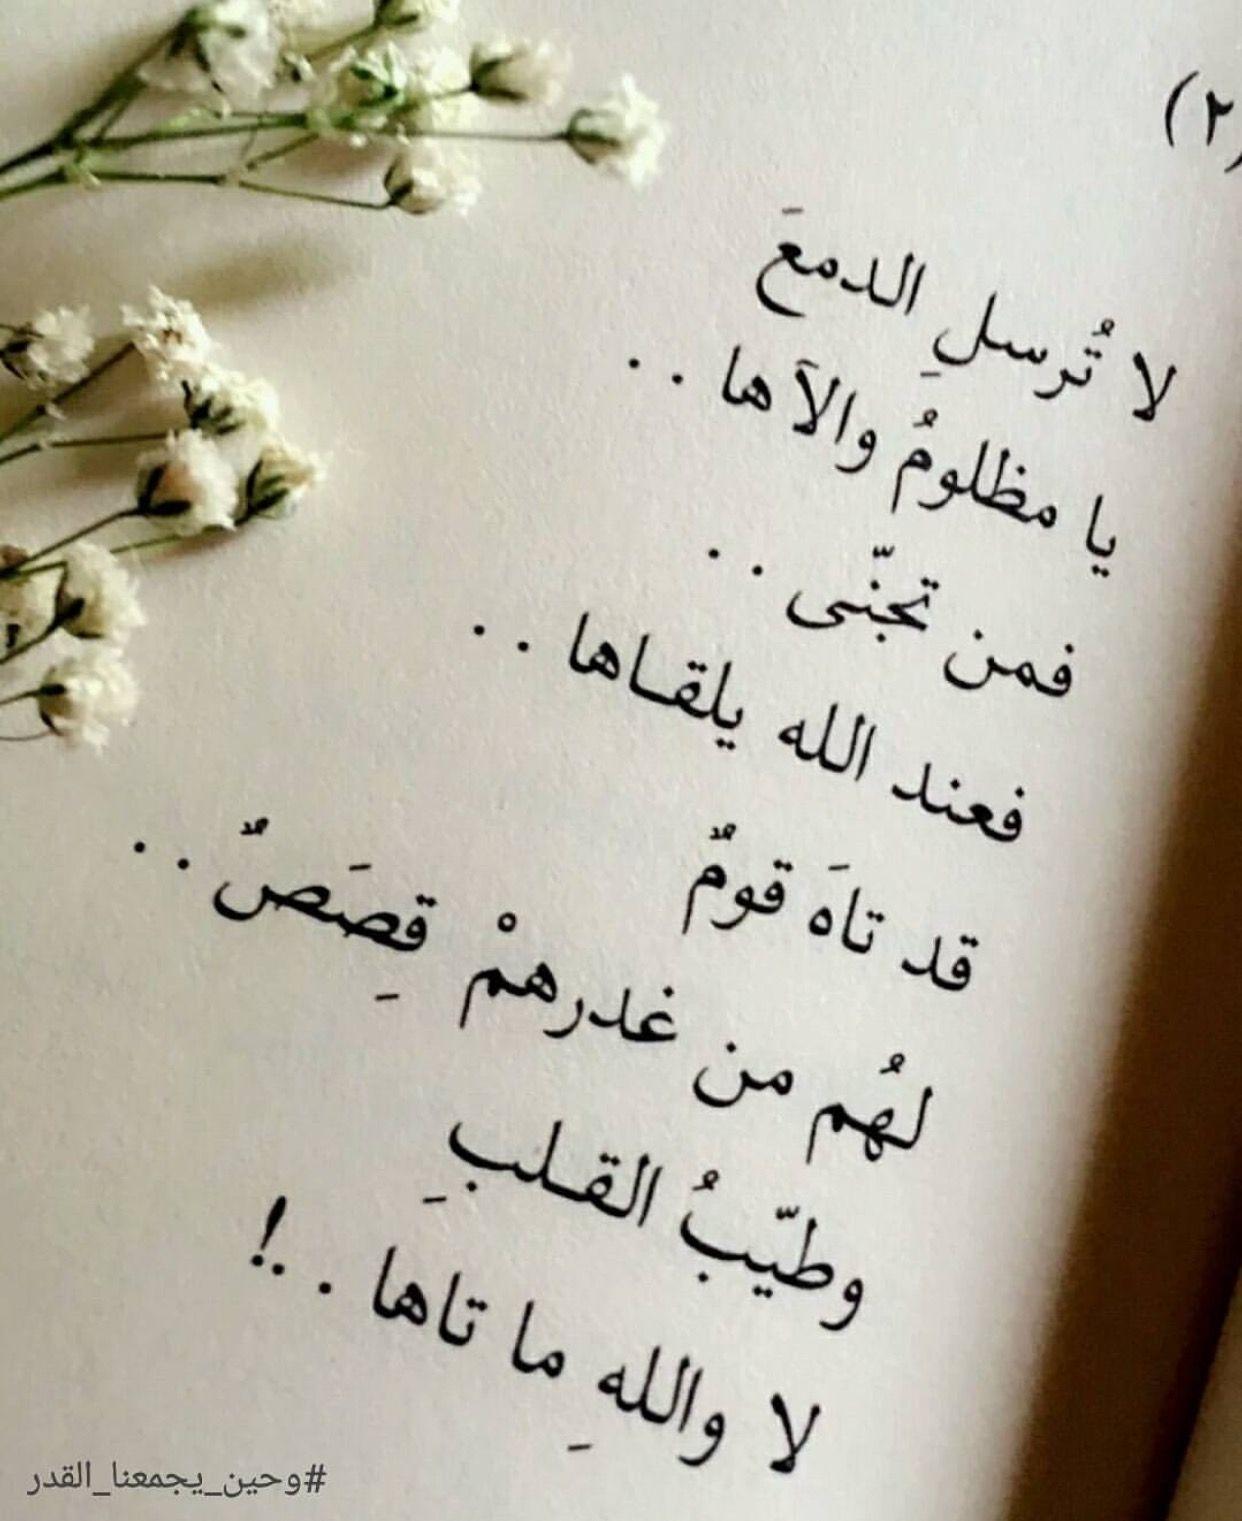 Desertrose والله ما تاهت طيبه القلب Cool Words Mood Quotes Arabic Words